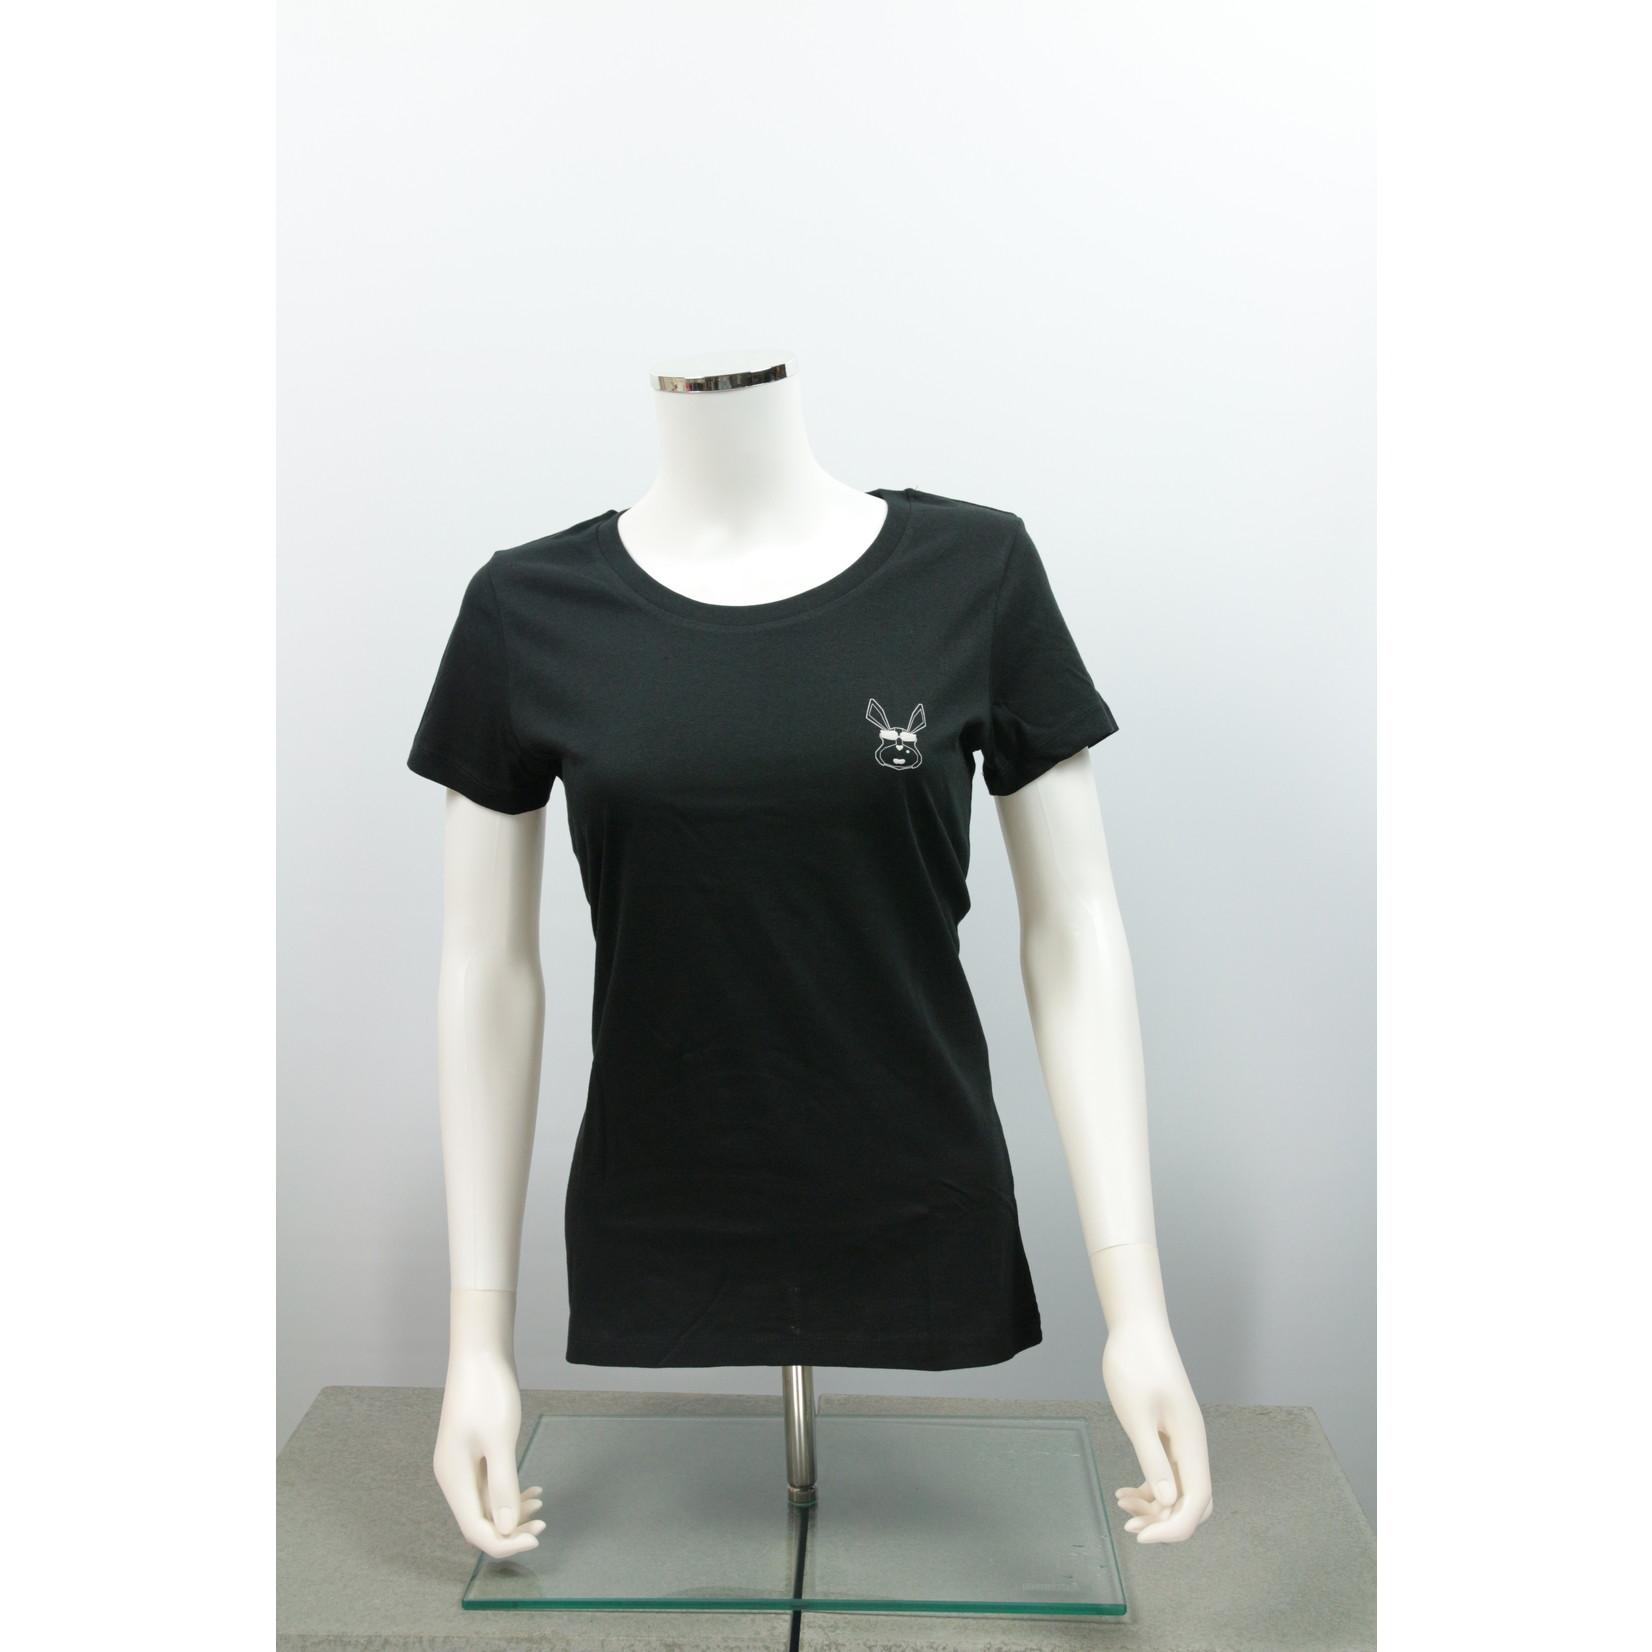 The Cool Rabbit Essentials Gentle Rose Black T-shirt Ladies